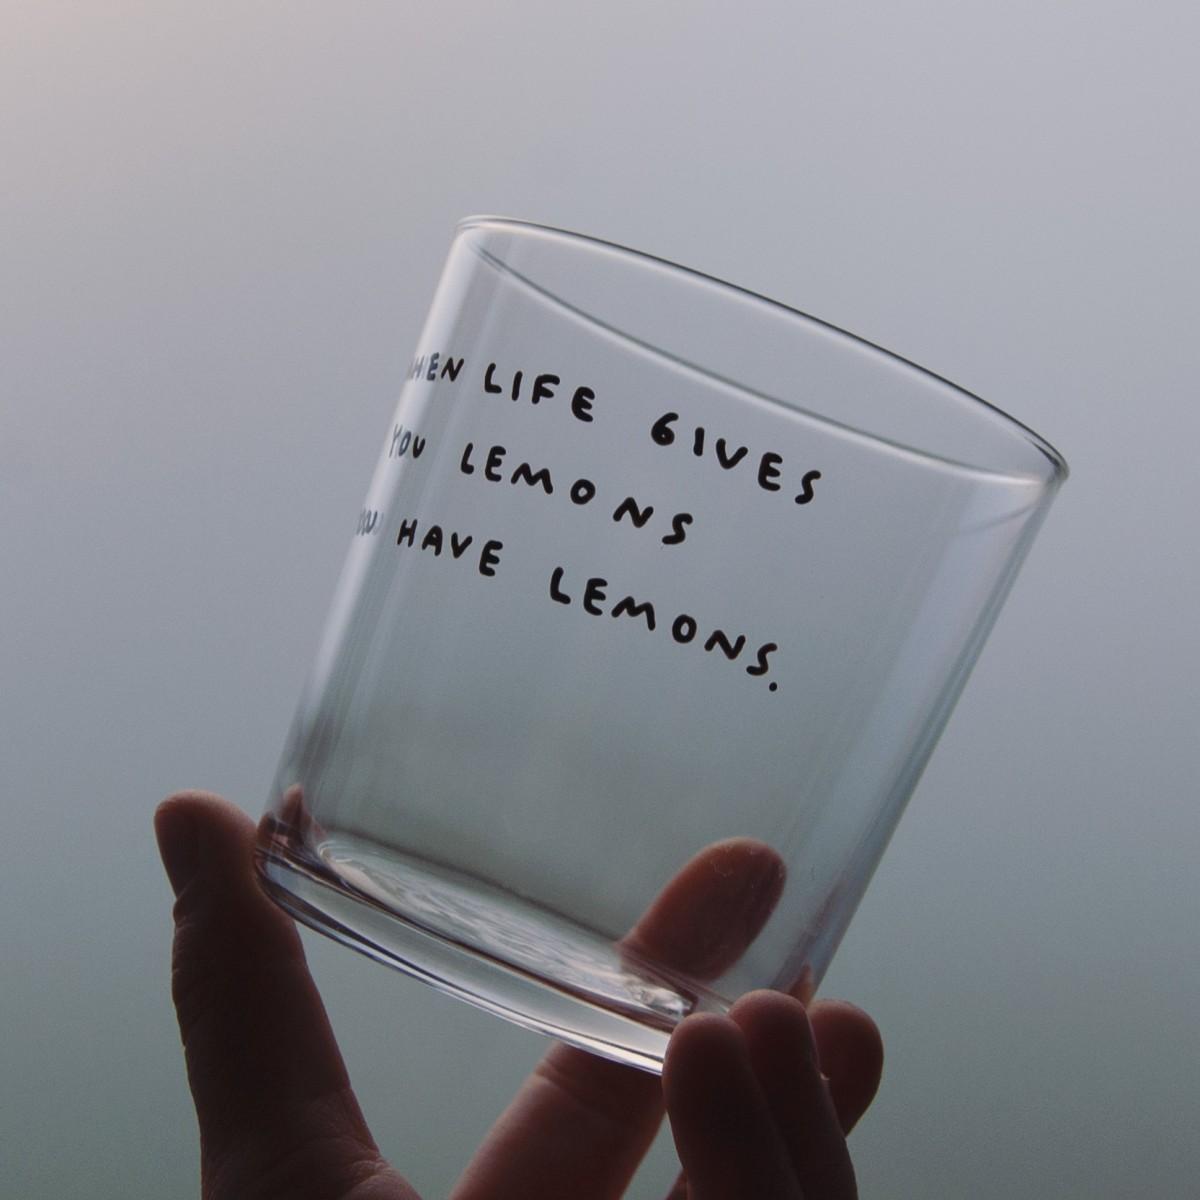 WHEN LIFE GIVES YOU LEMONS YOU HAVE LEMONS Glas – Johanna Schwarzer